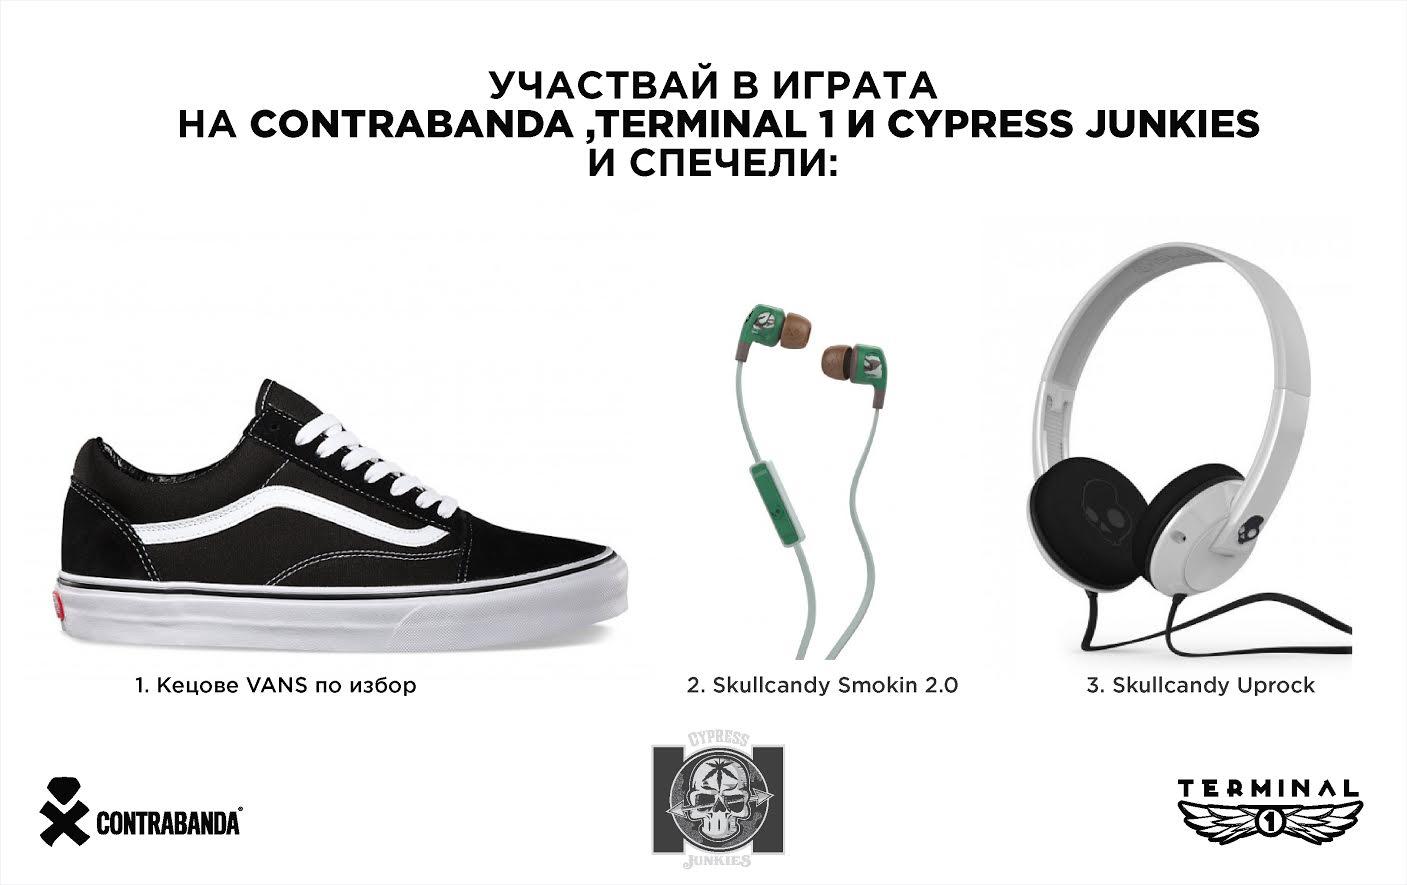 Участвай в играта на Contrabanda, Cypress Junkies и Club Terminal 1